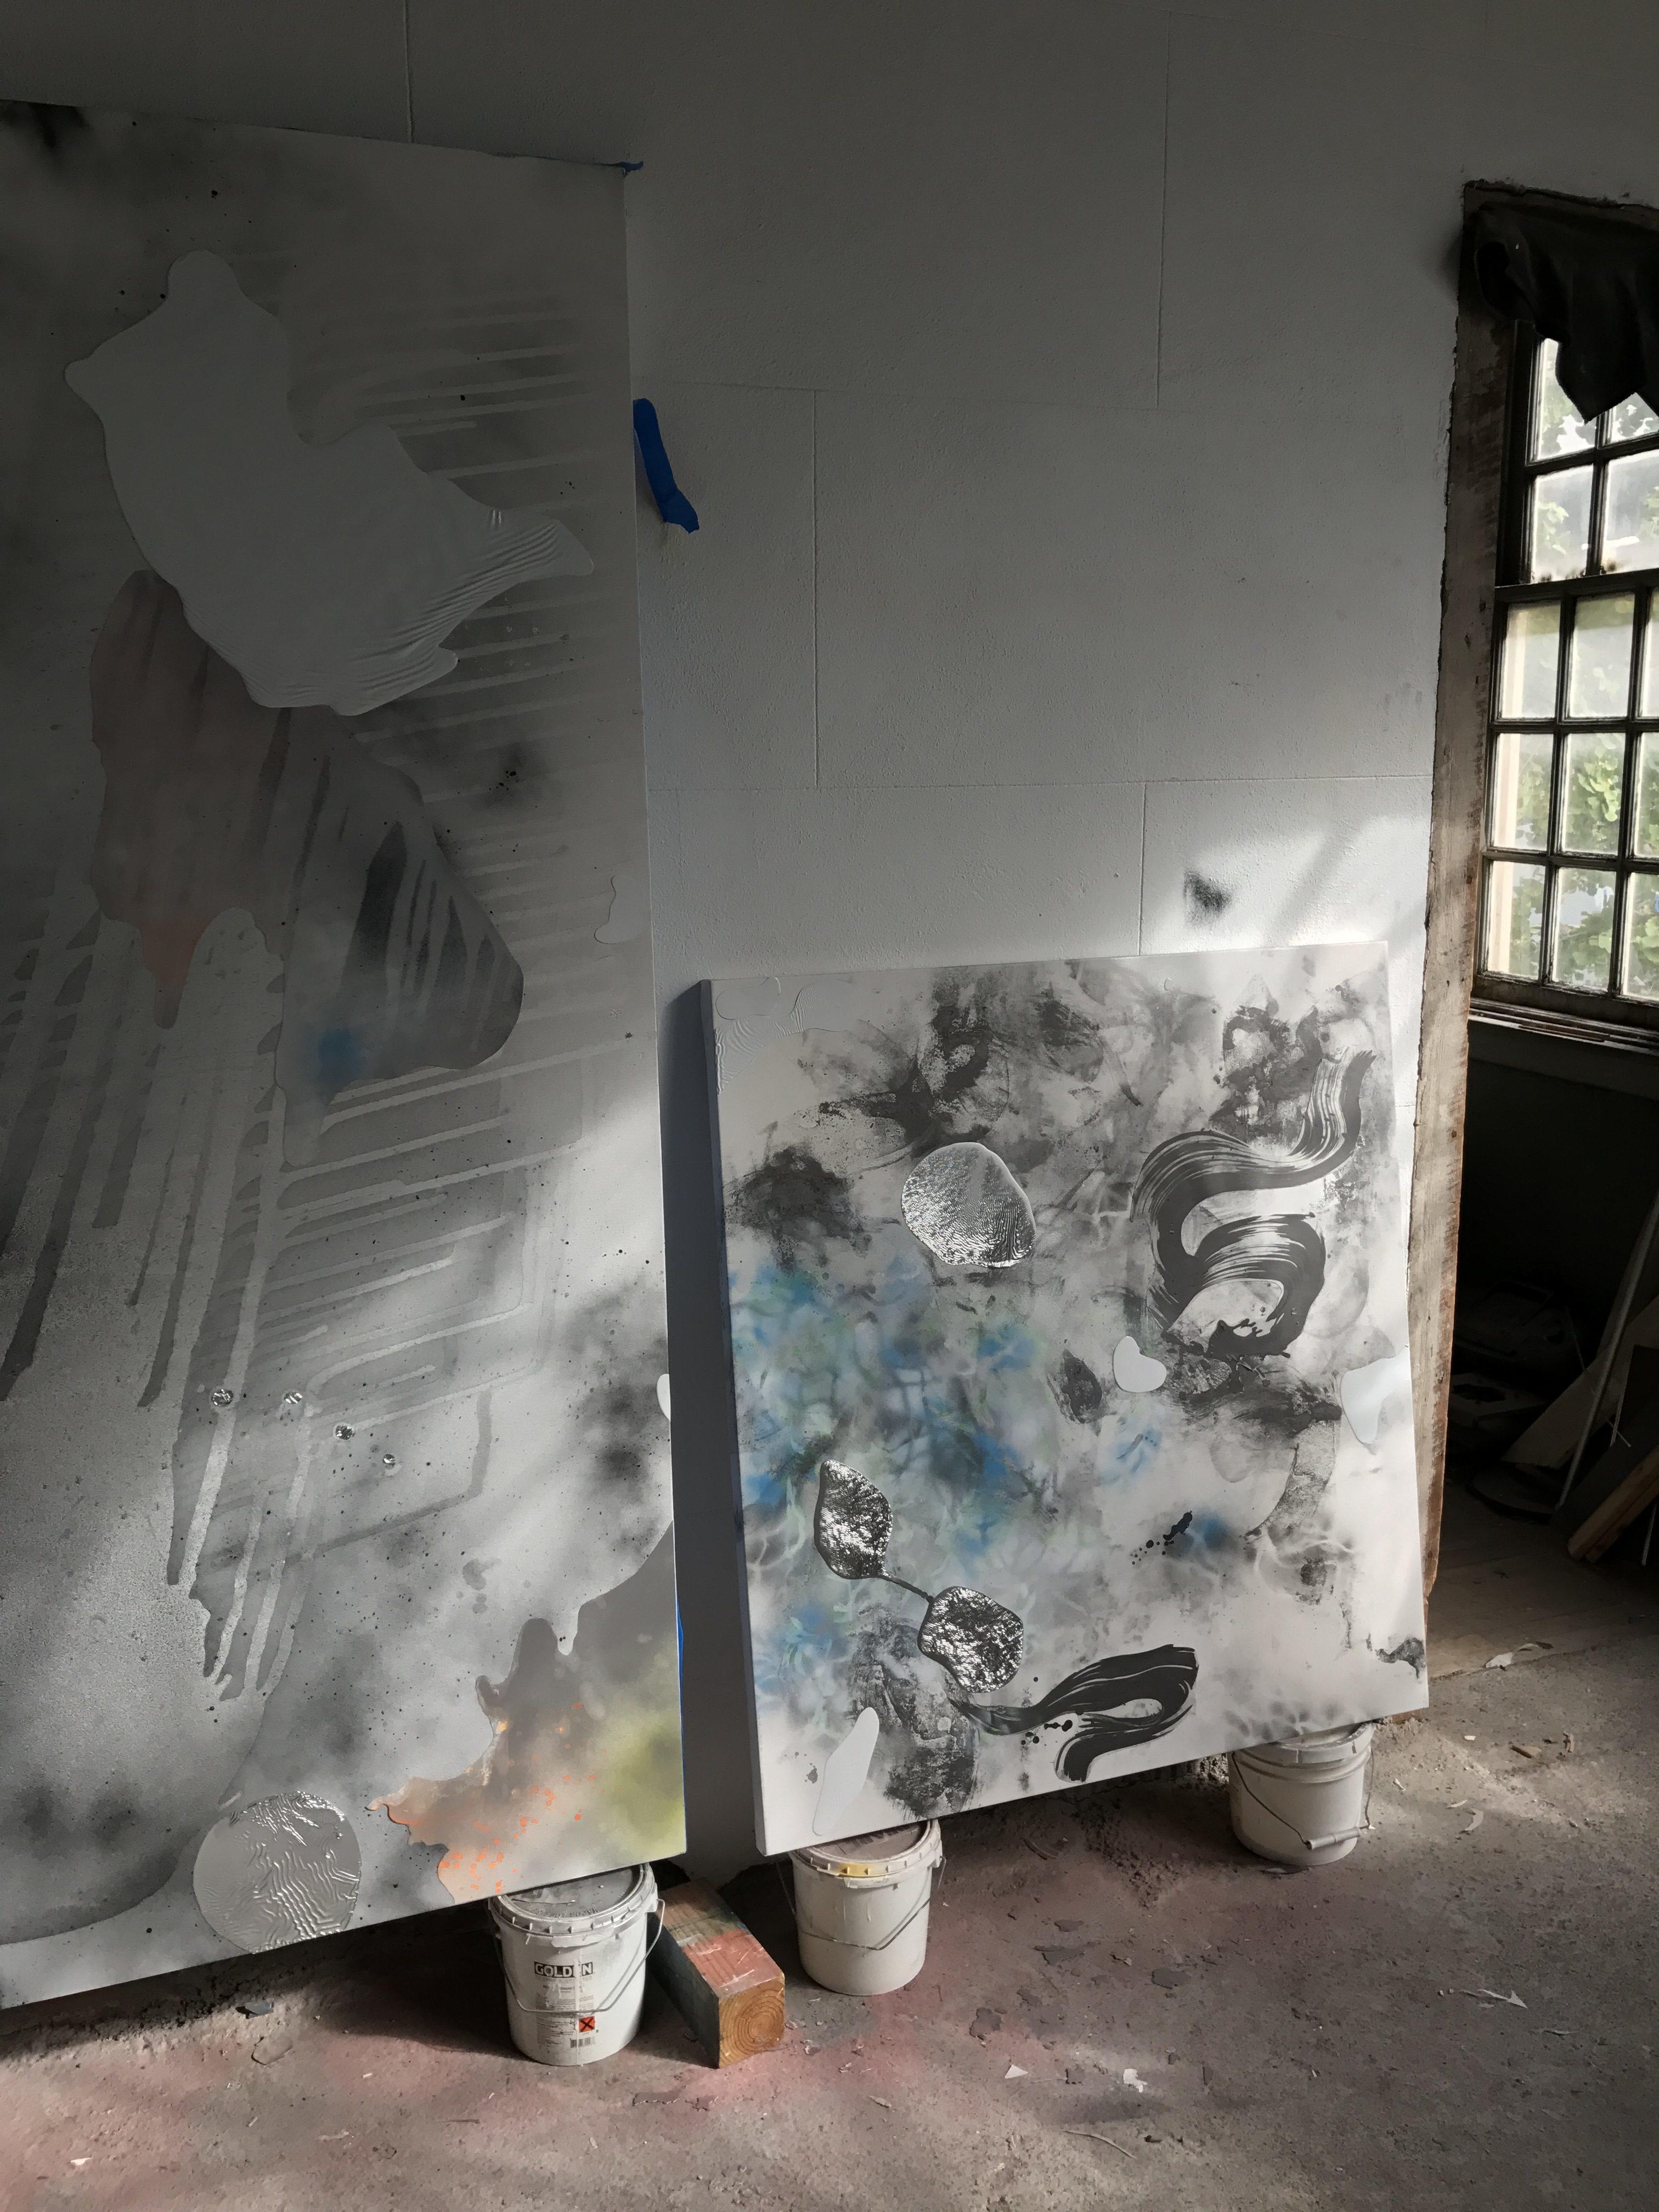 Richard Feaster, Studio Visit, November 2016